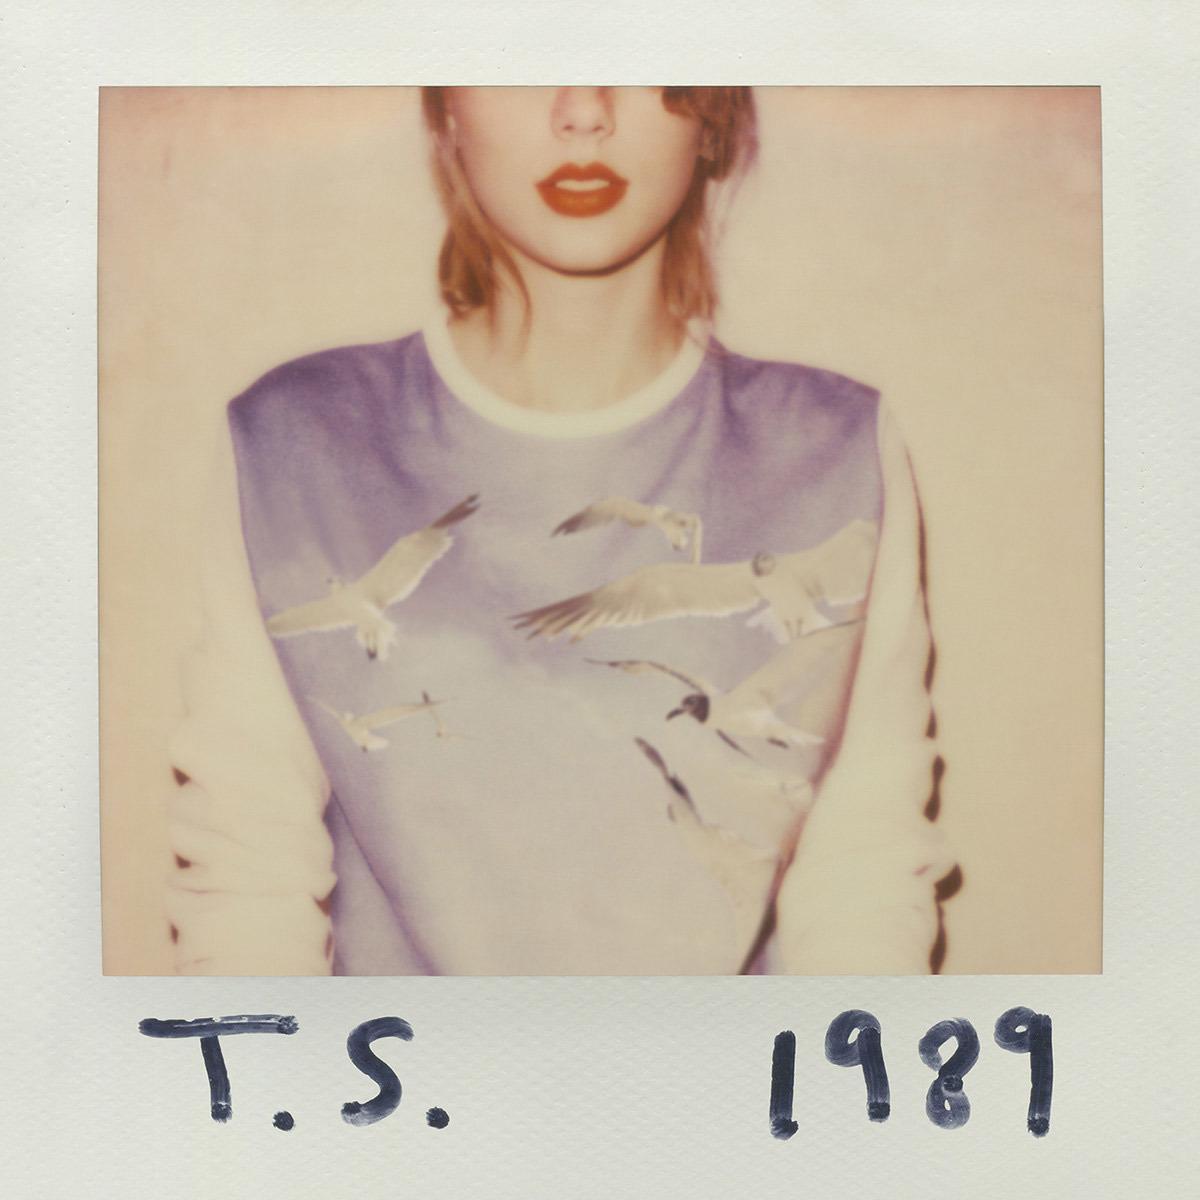 1989(Standardedition)